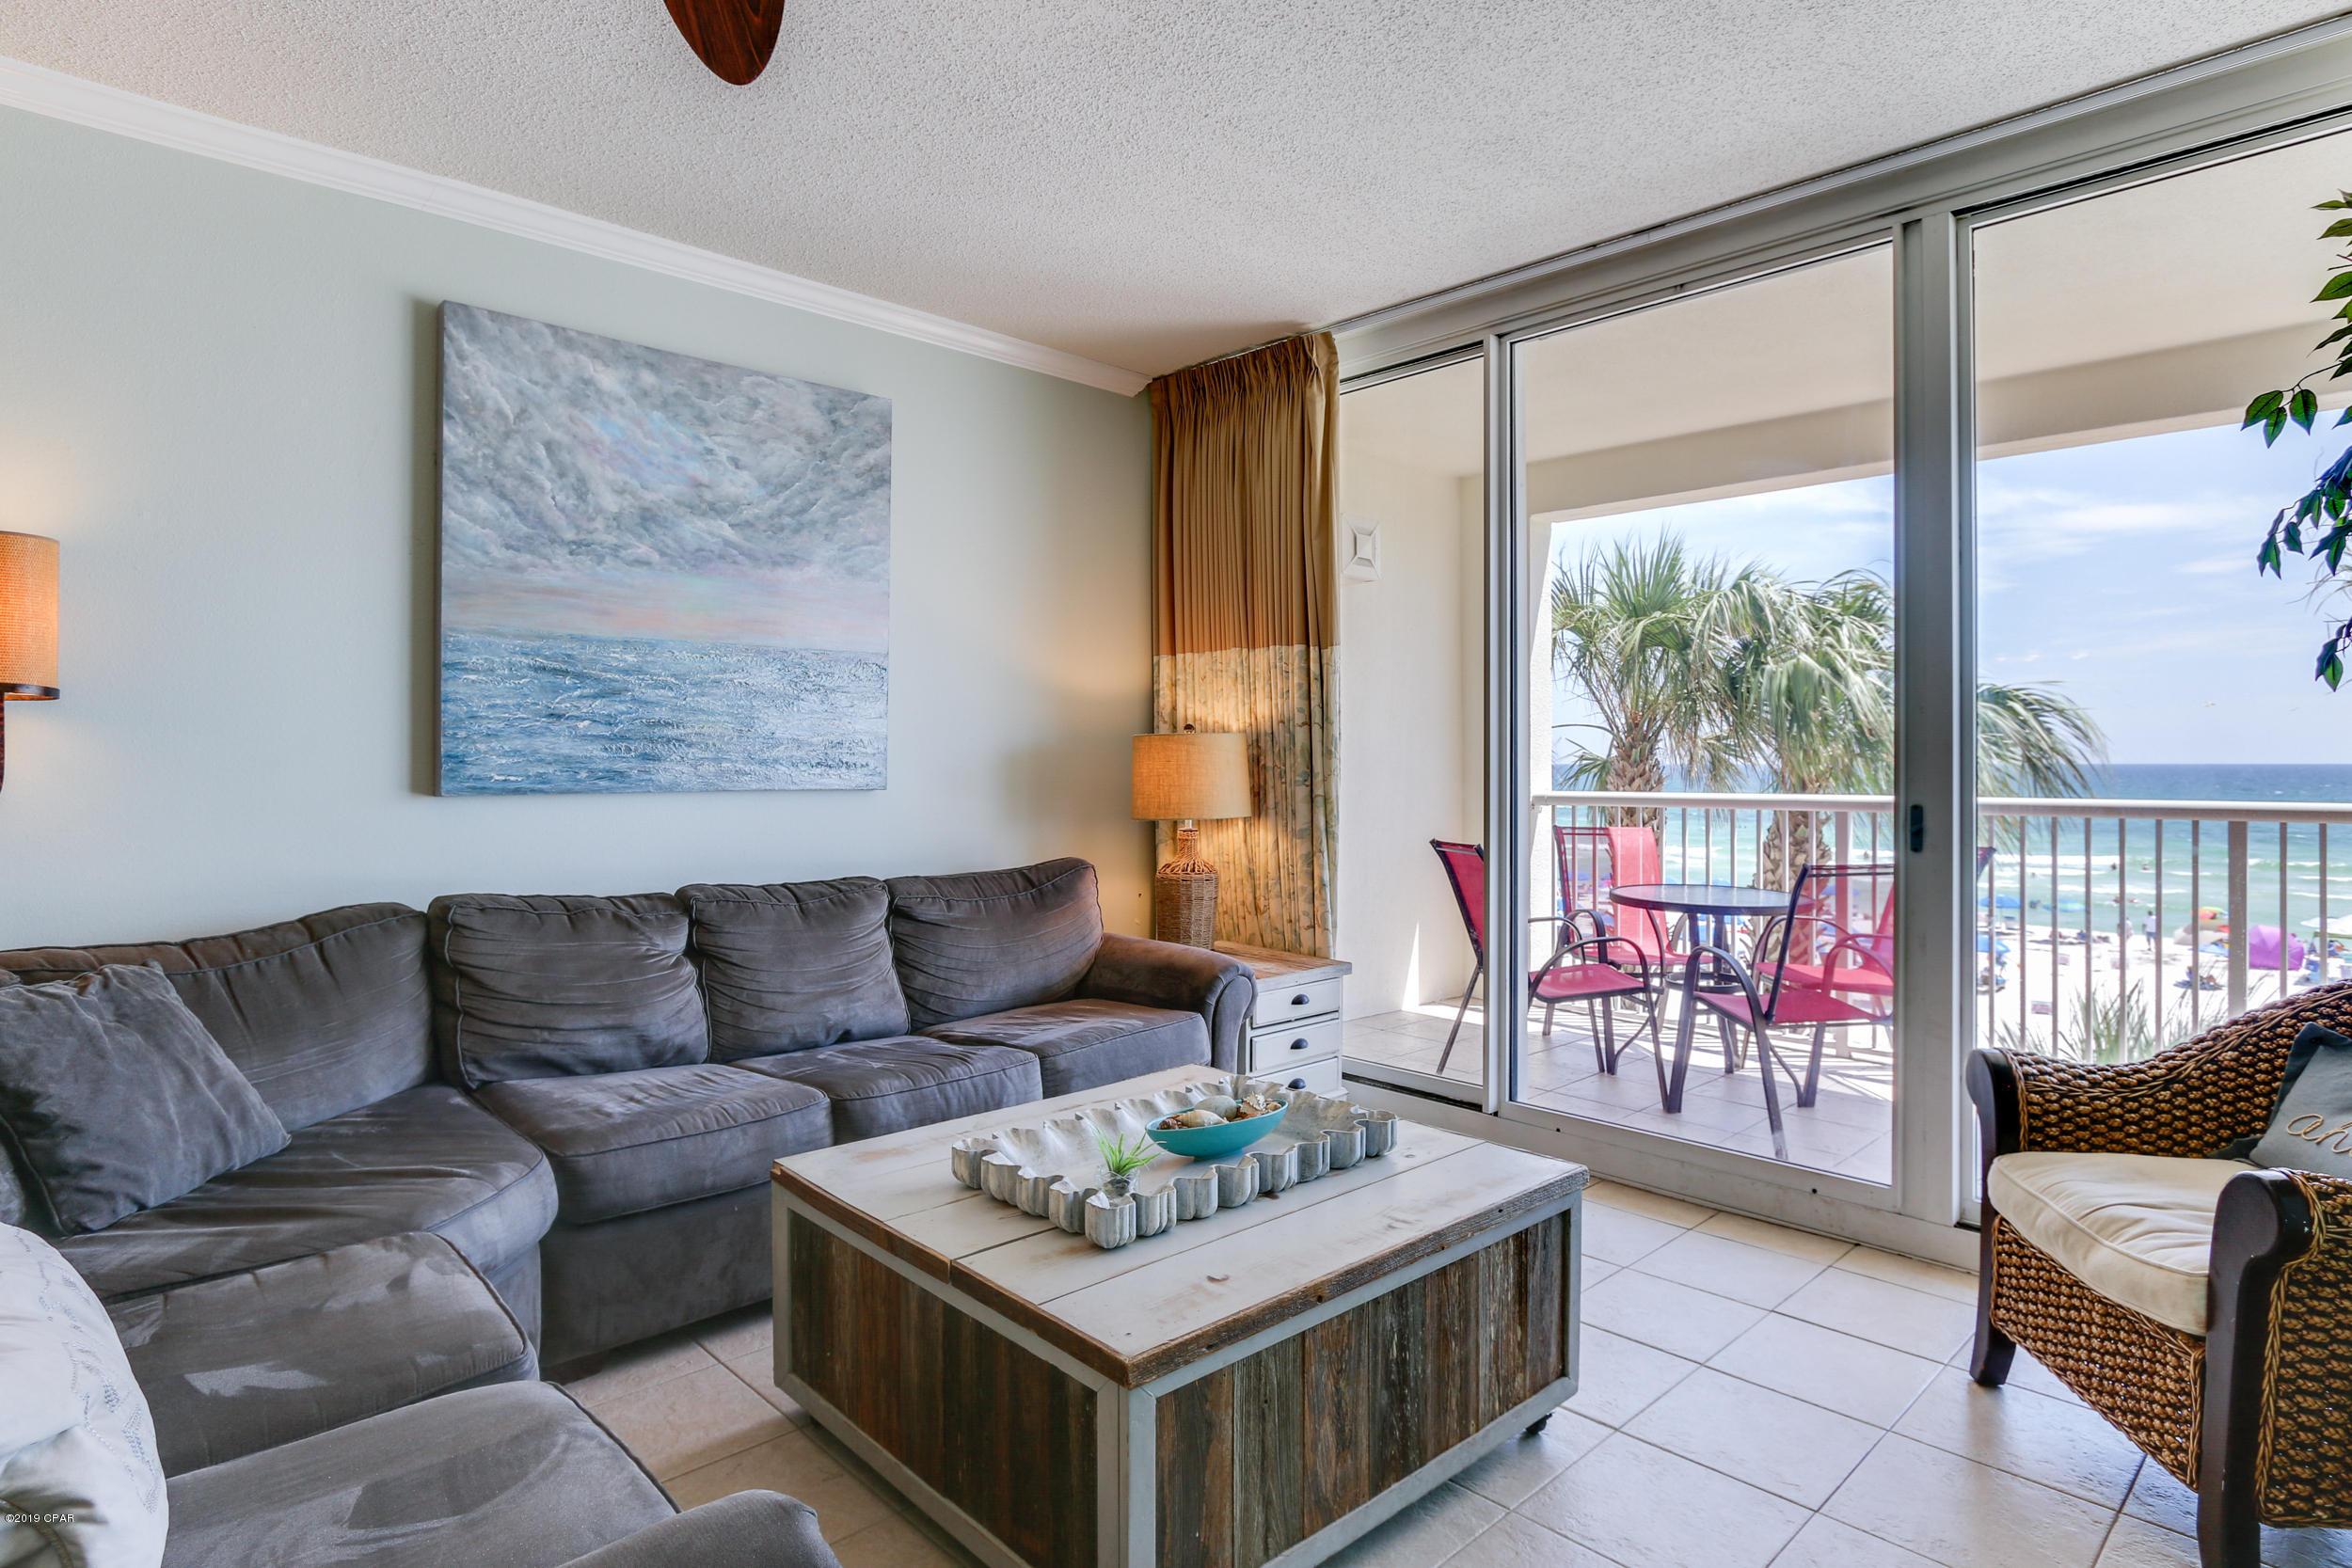 A 3 Bedroom 3 Bedroom Majestic Beach Tower I Condominium